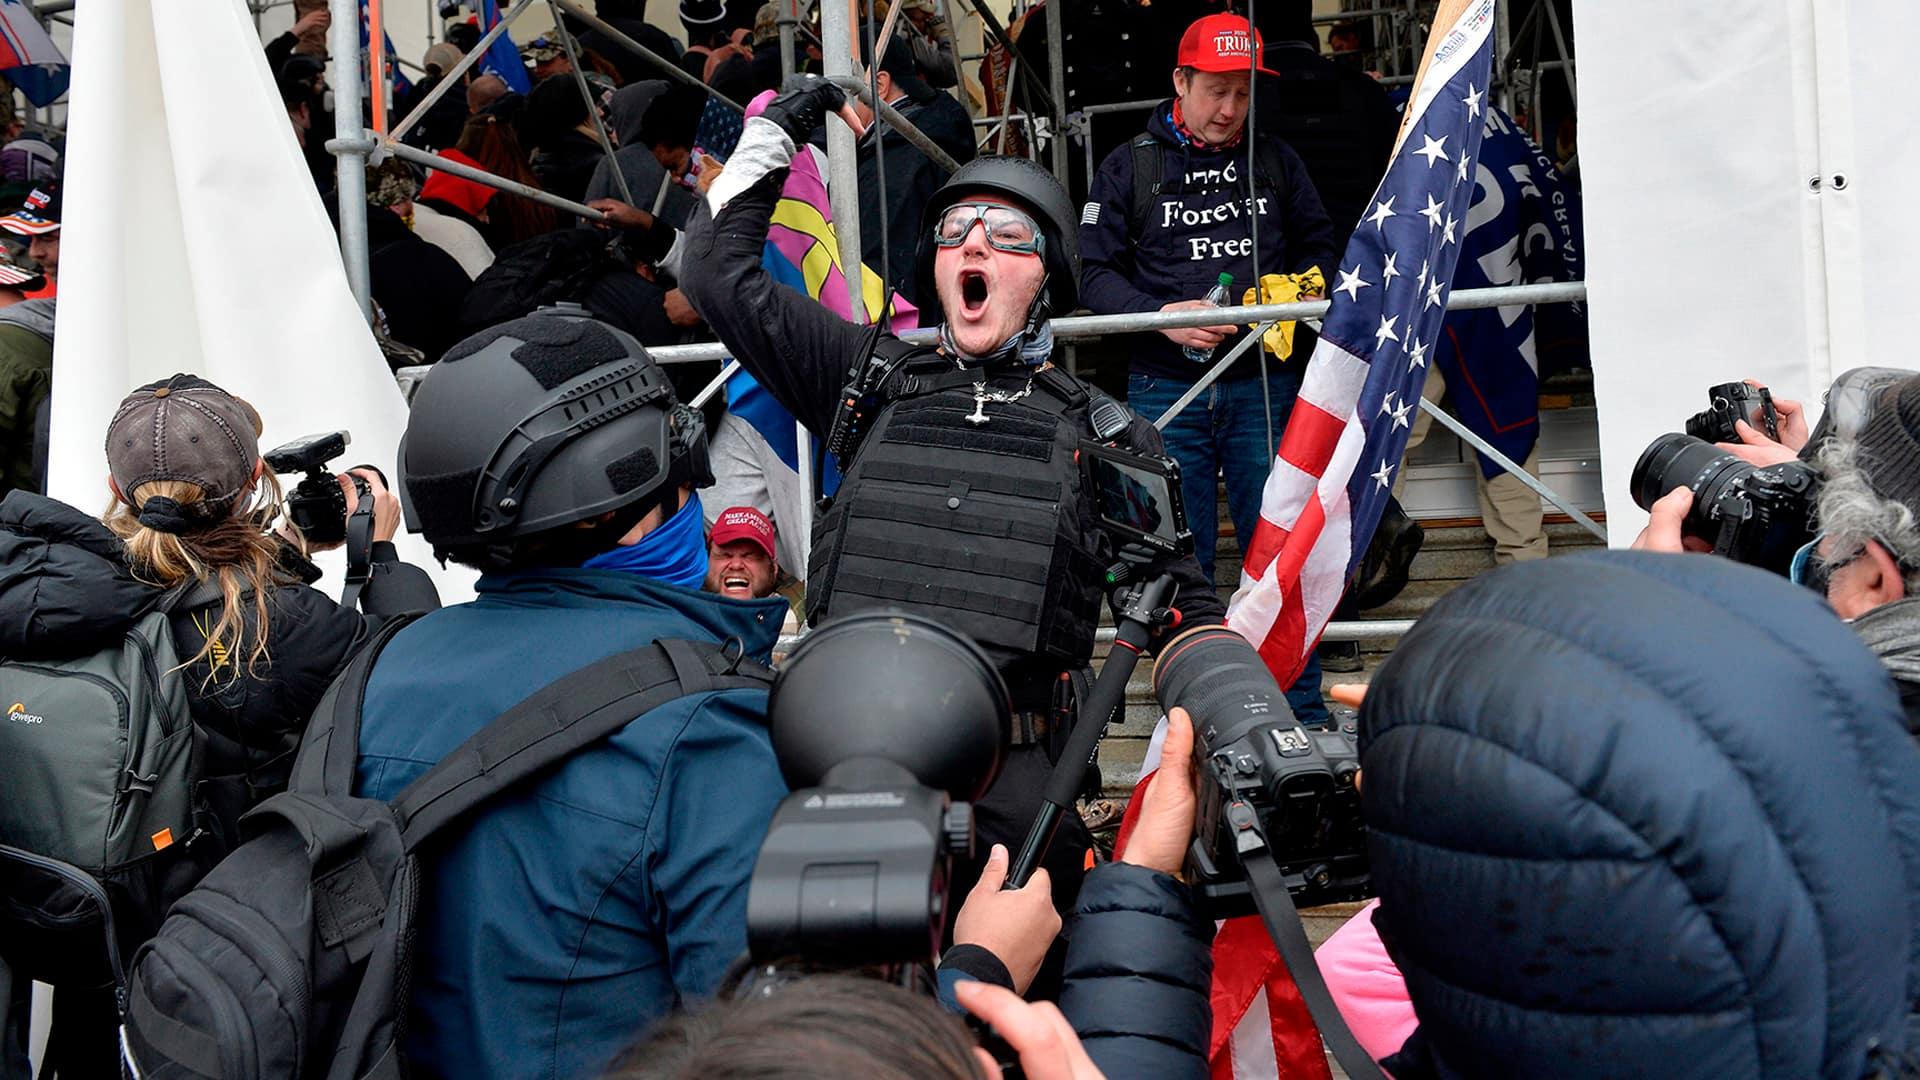 ca.news.yahoo.com: U.S. security officials point fingers for Capitol Hill riots